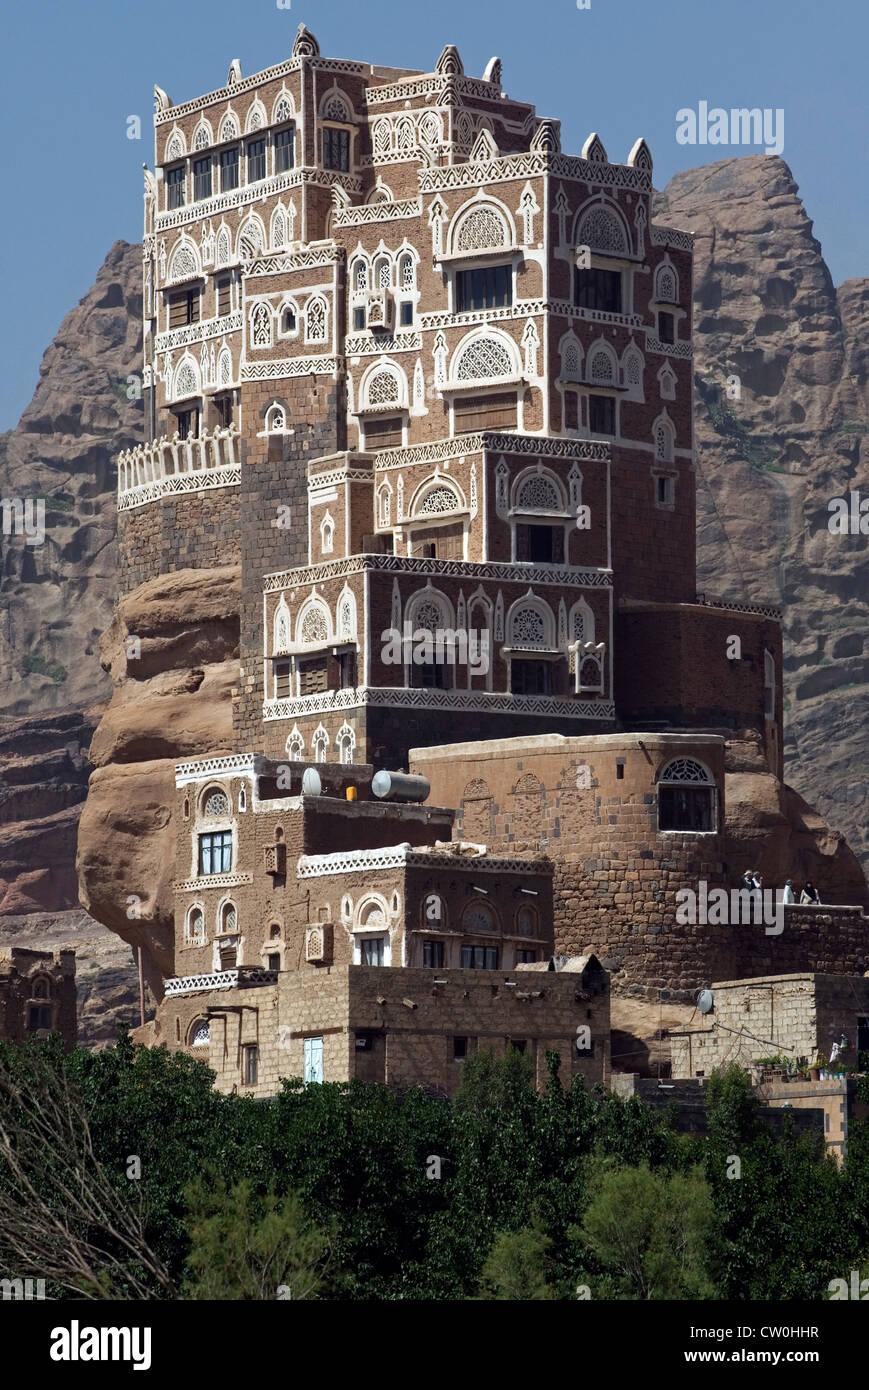 Dar Al Hajar The Rock Palace In Wadi Dhahr Yemen Western